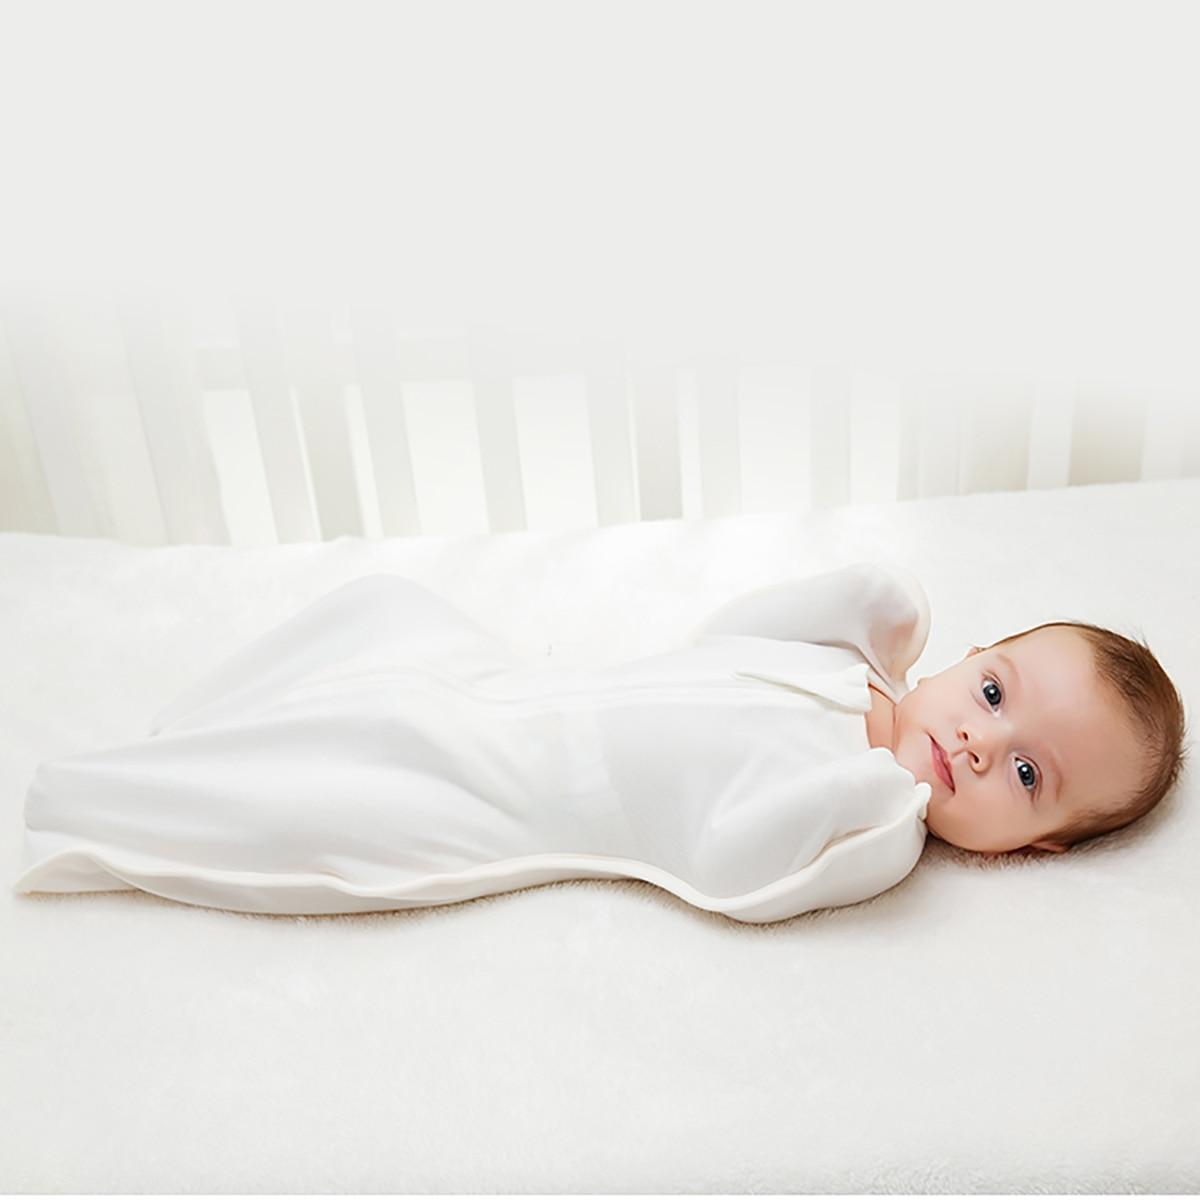 Infant Cocoon Baby Sleeping Bag Envelope For Newborn Sleep Sack 0-3 Months Bamboo Fiber Swaddle 2 Zipper Designer Sleepsack Baby